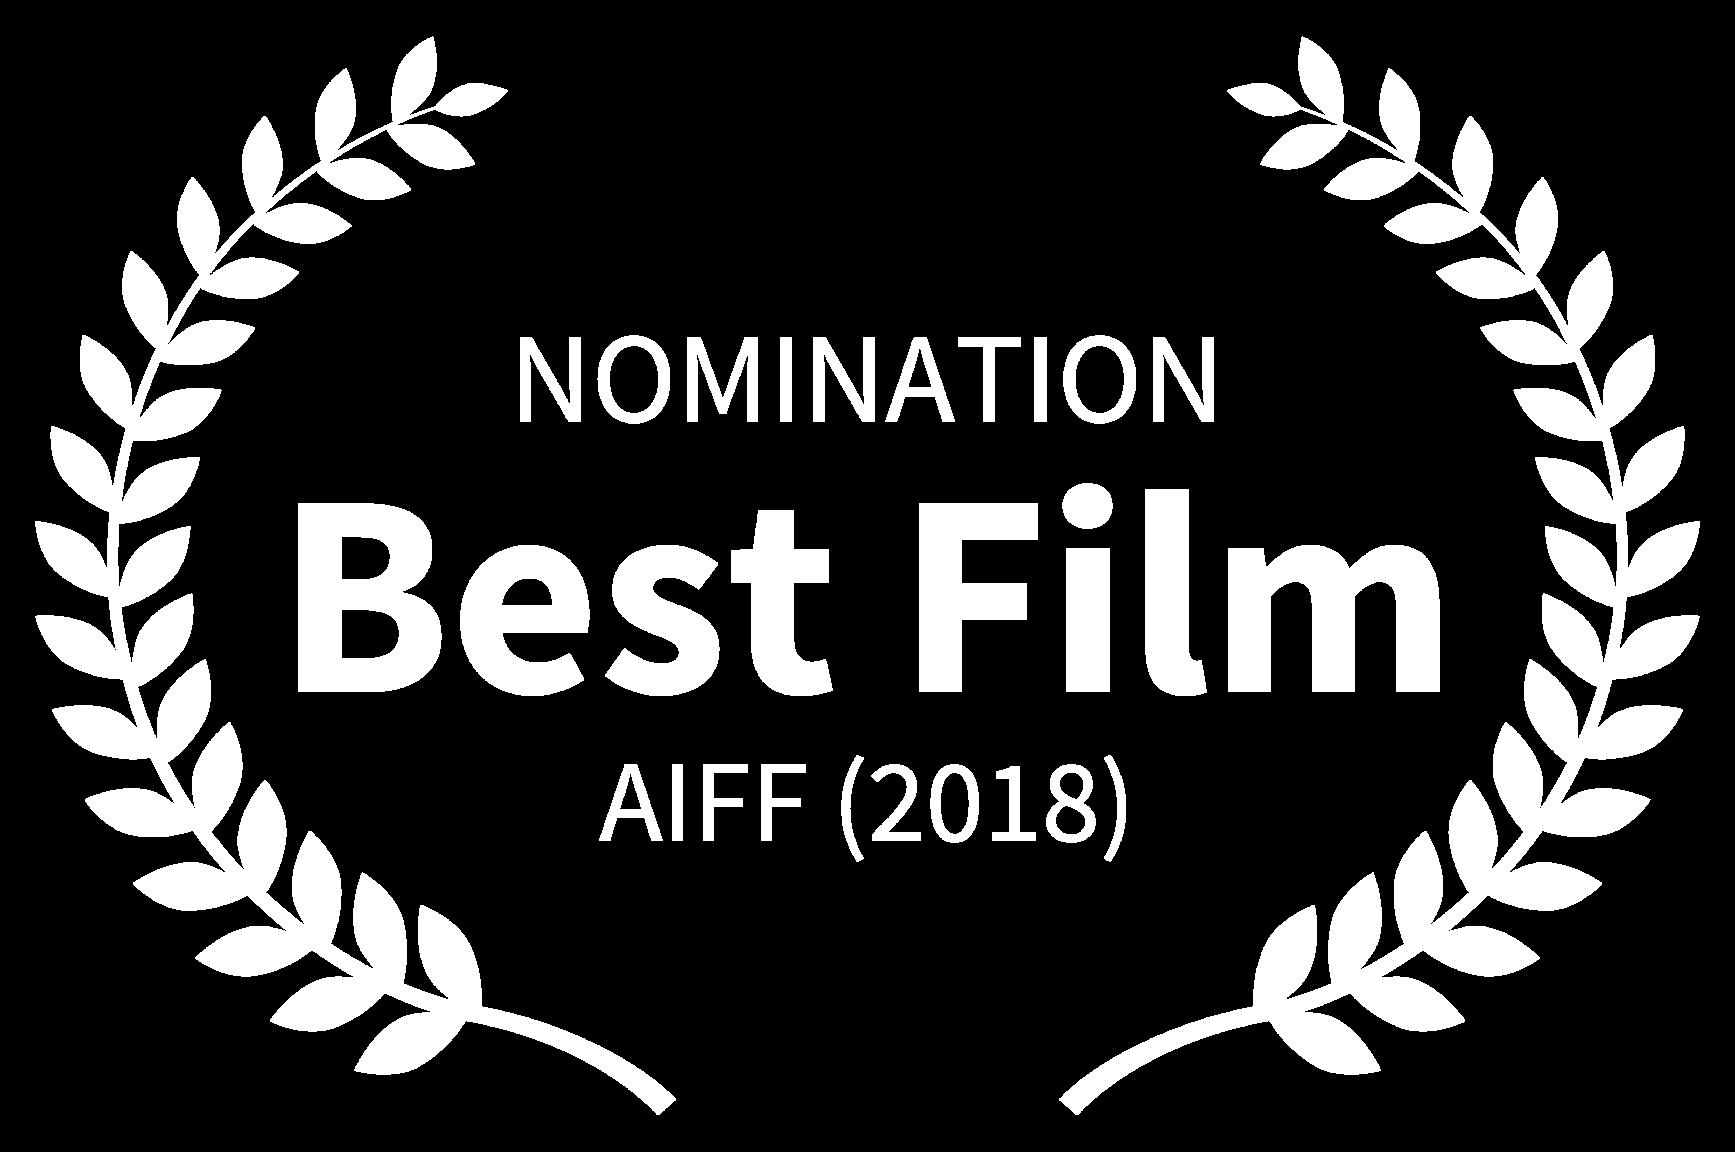 NOMINATION - Best Film - AIFF 2018